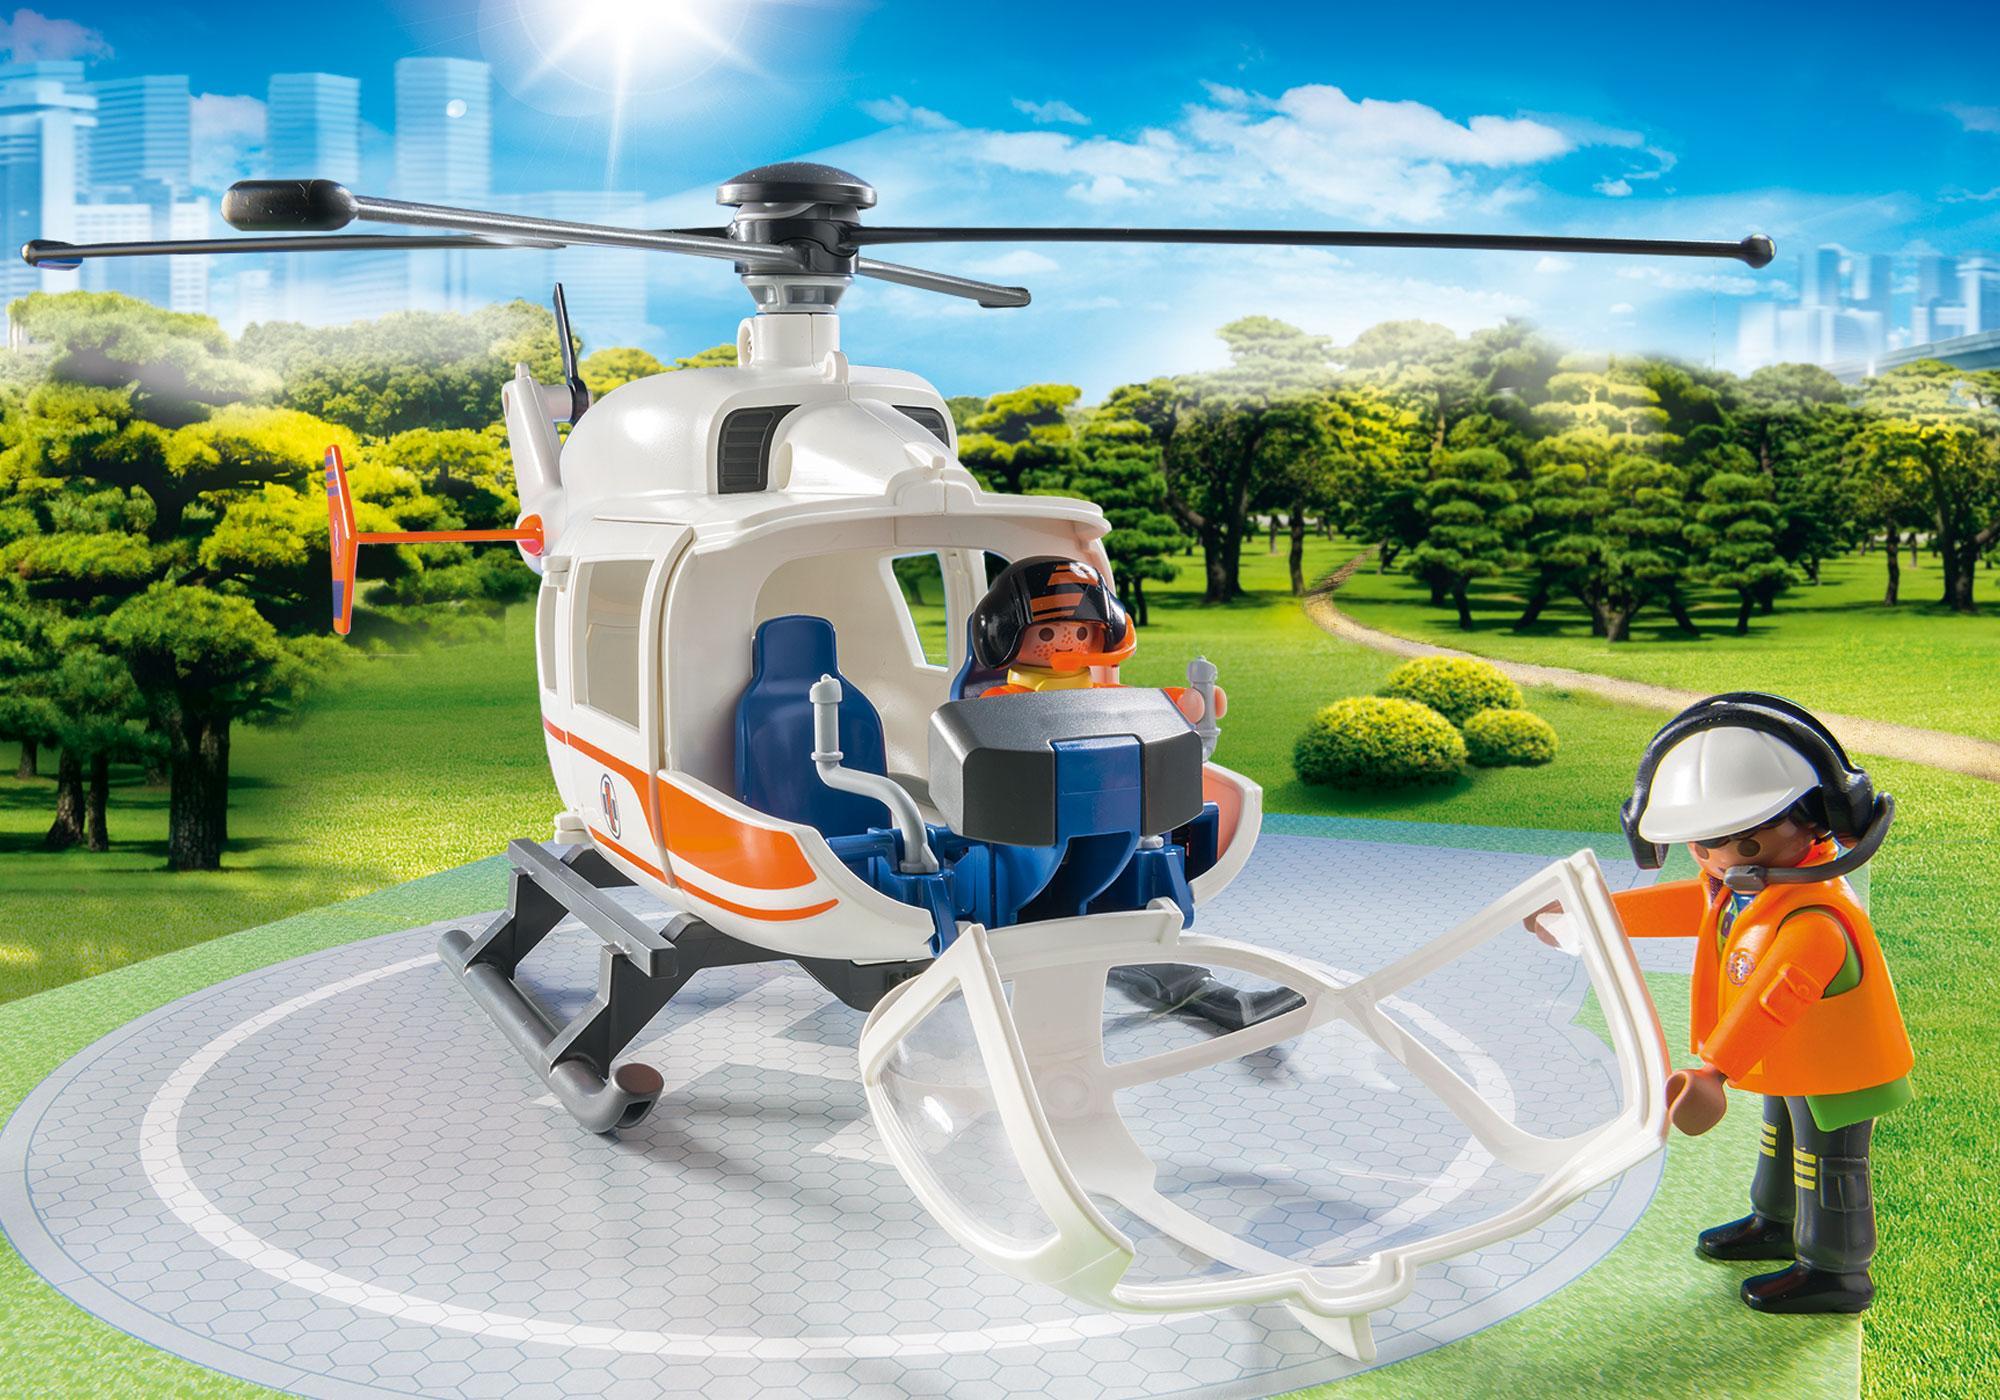 http://media.playmobil.com/i/playmobil/70048_product_extra1/Räddningshelikopter